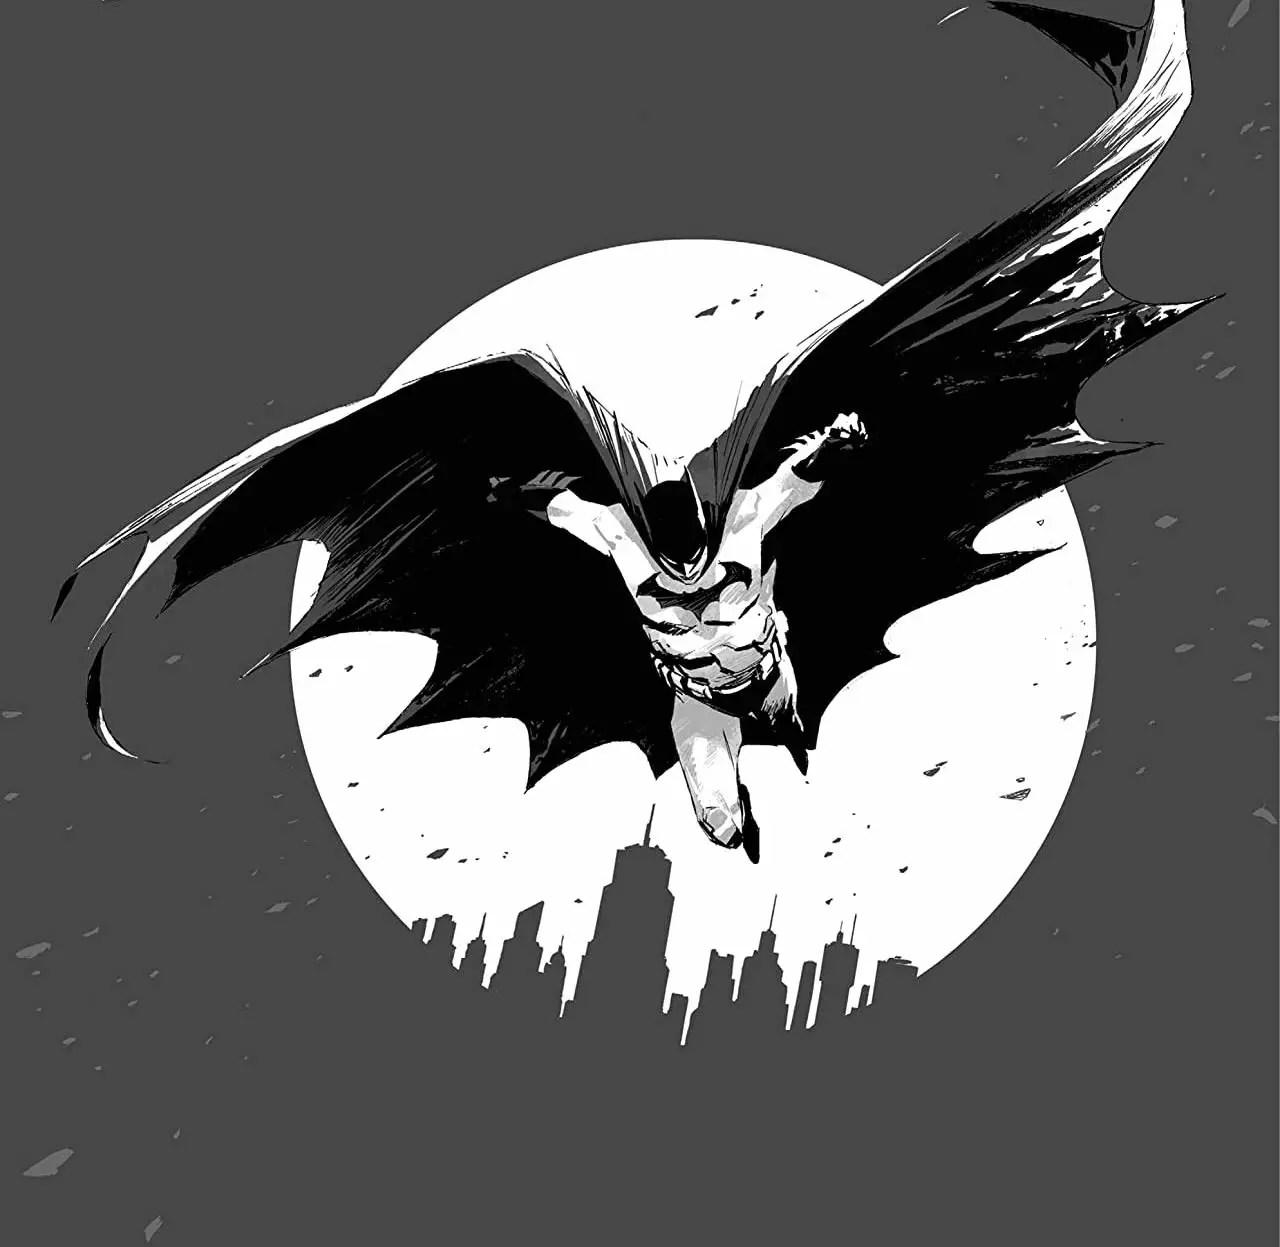 'Batman: Black & White' #5 features the best comics art of the week